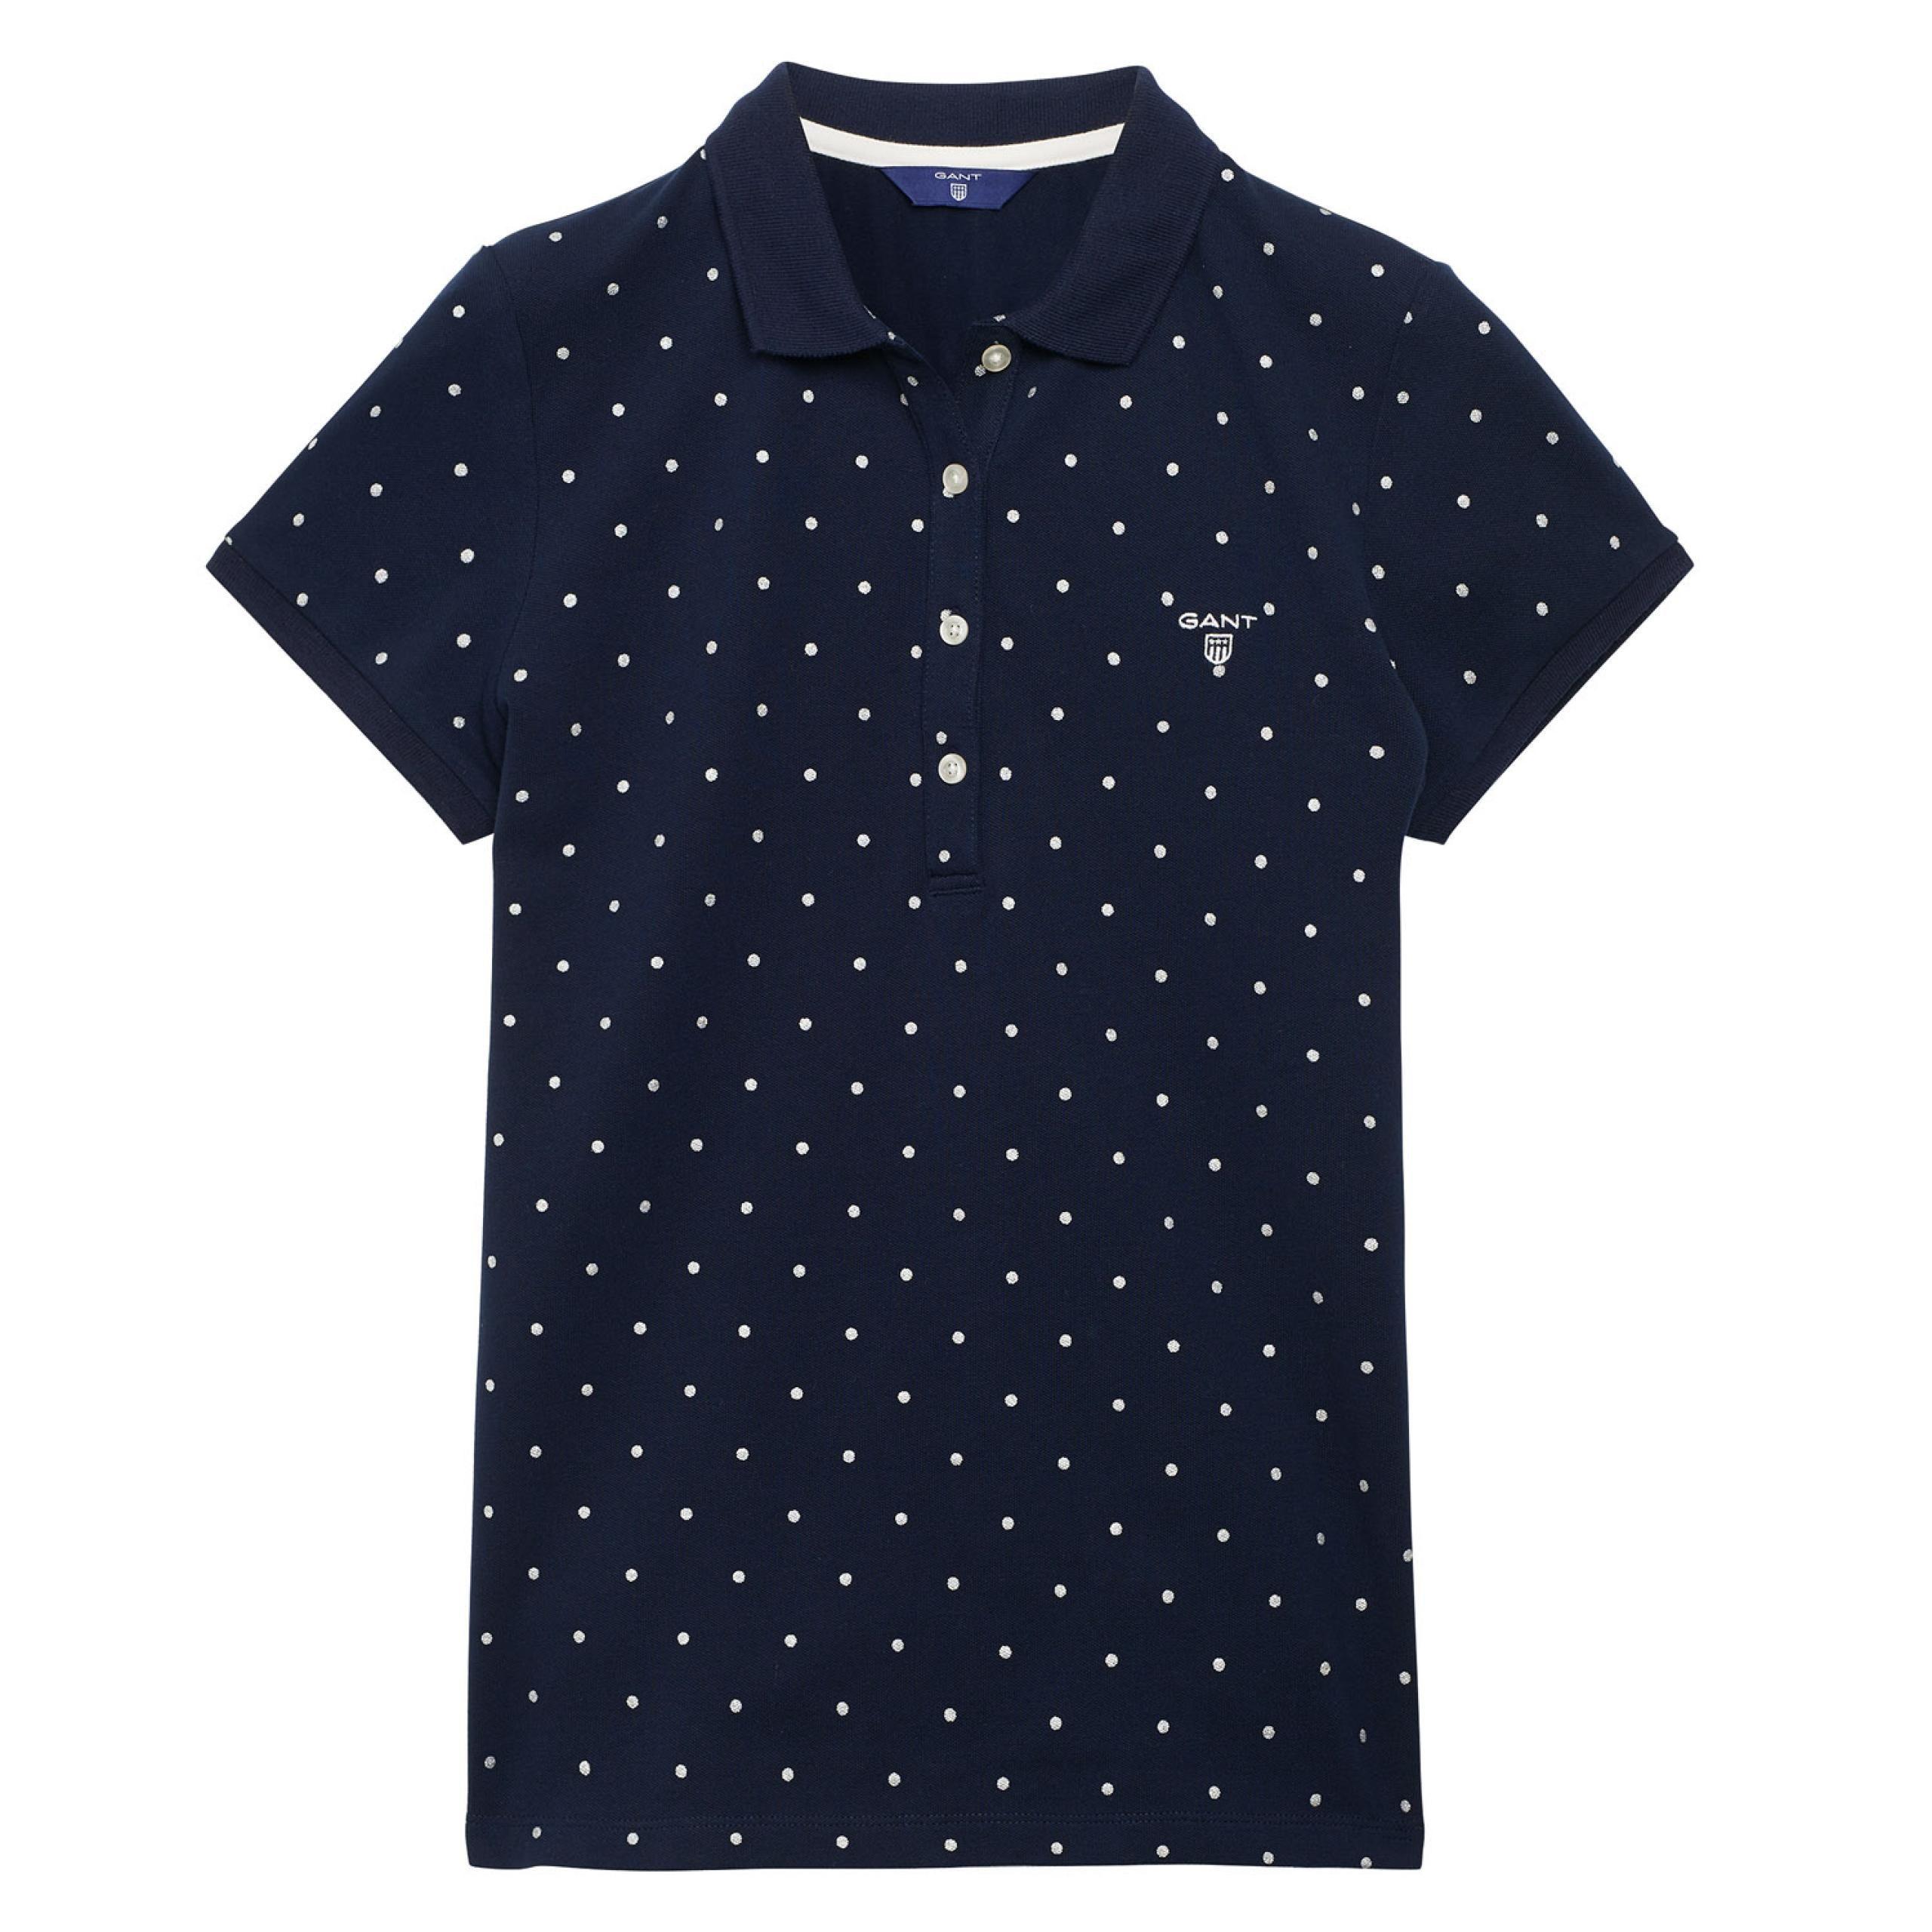 ea2d253ed43 GANT  Blue Dot Pique Polo Shirt women